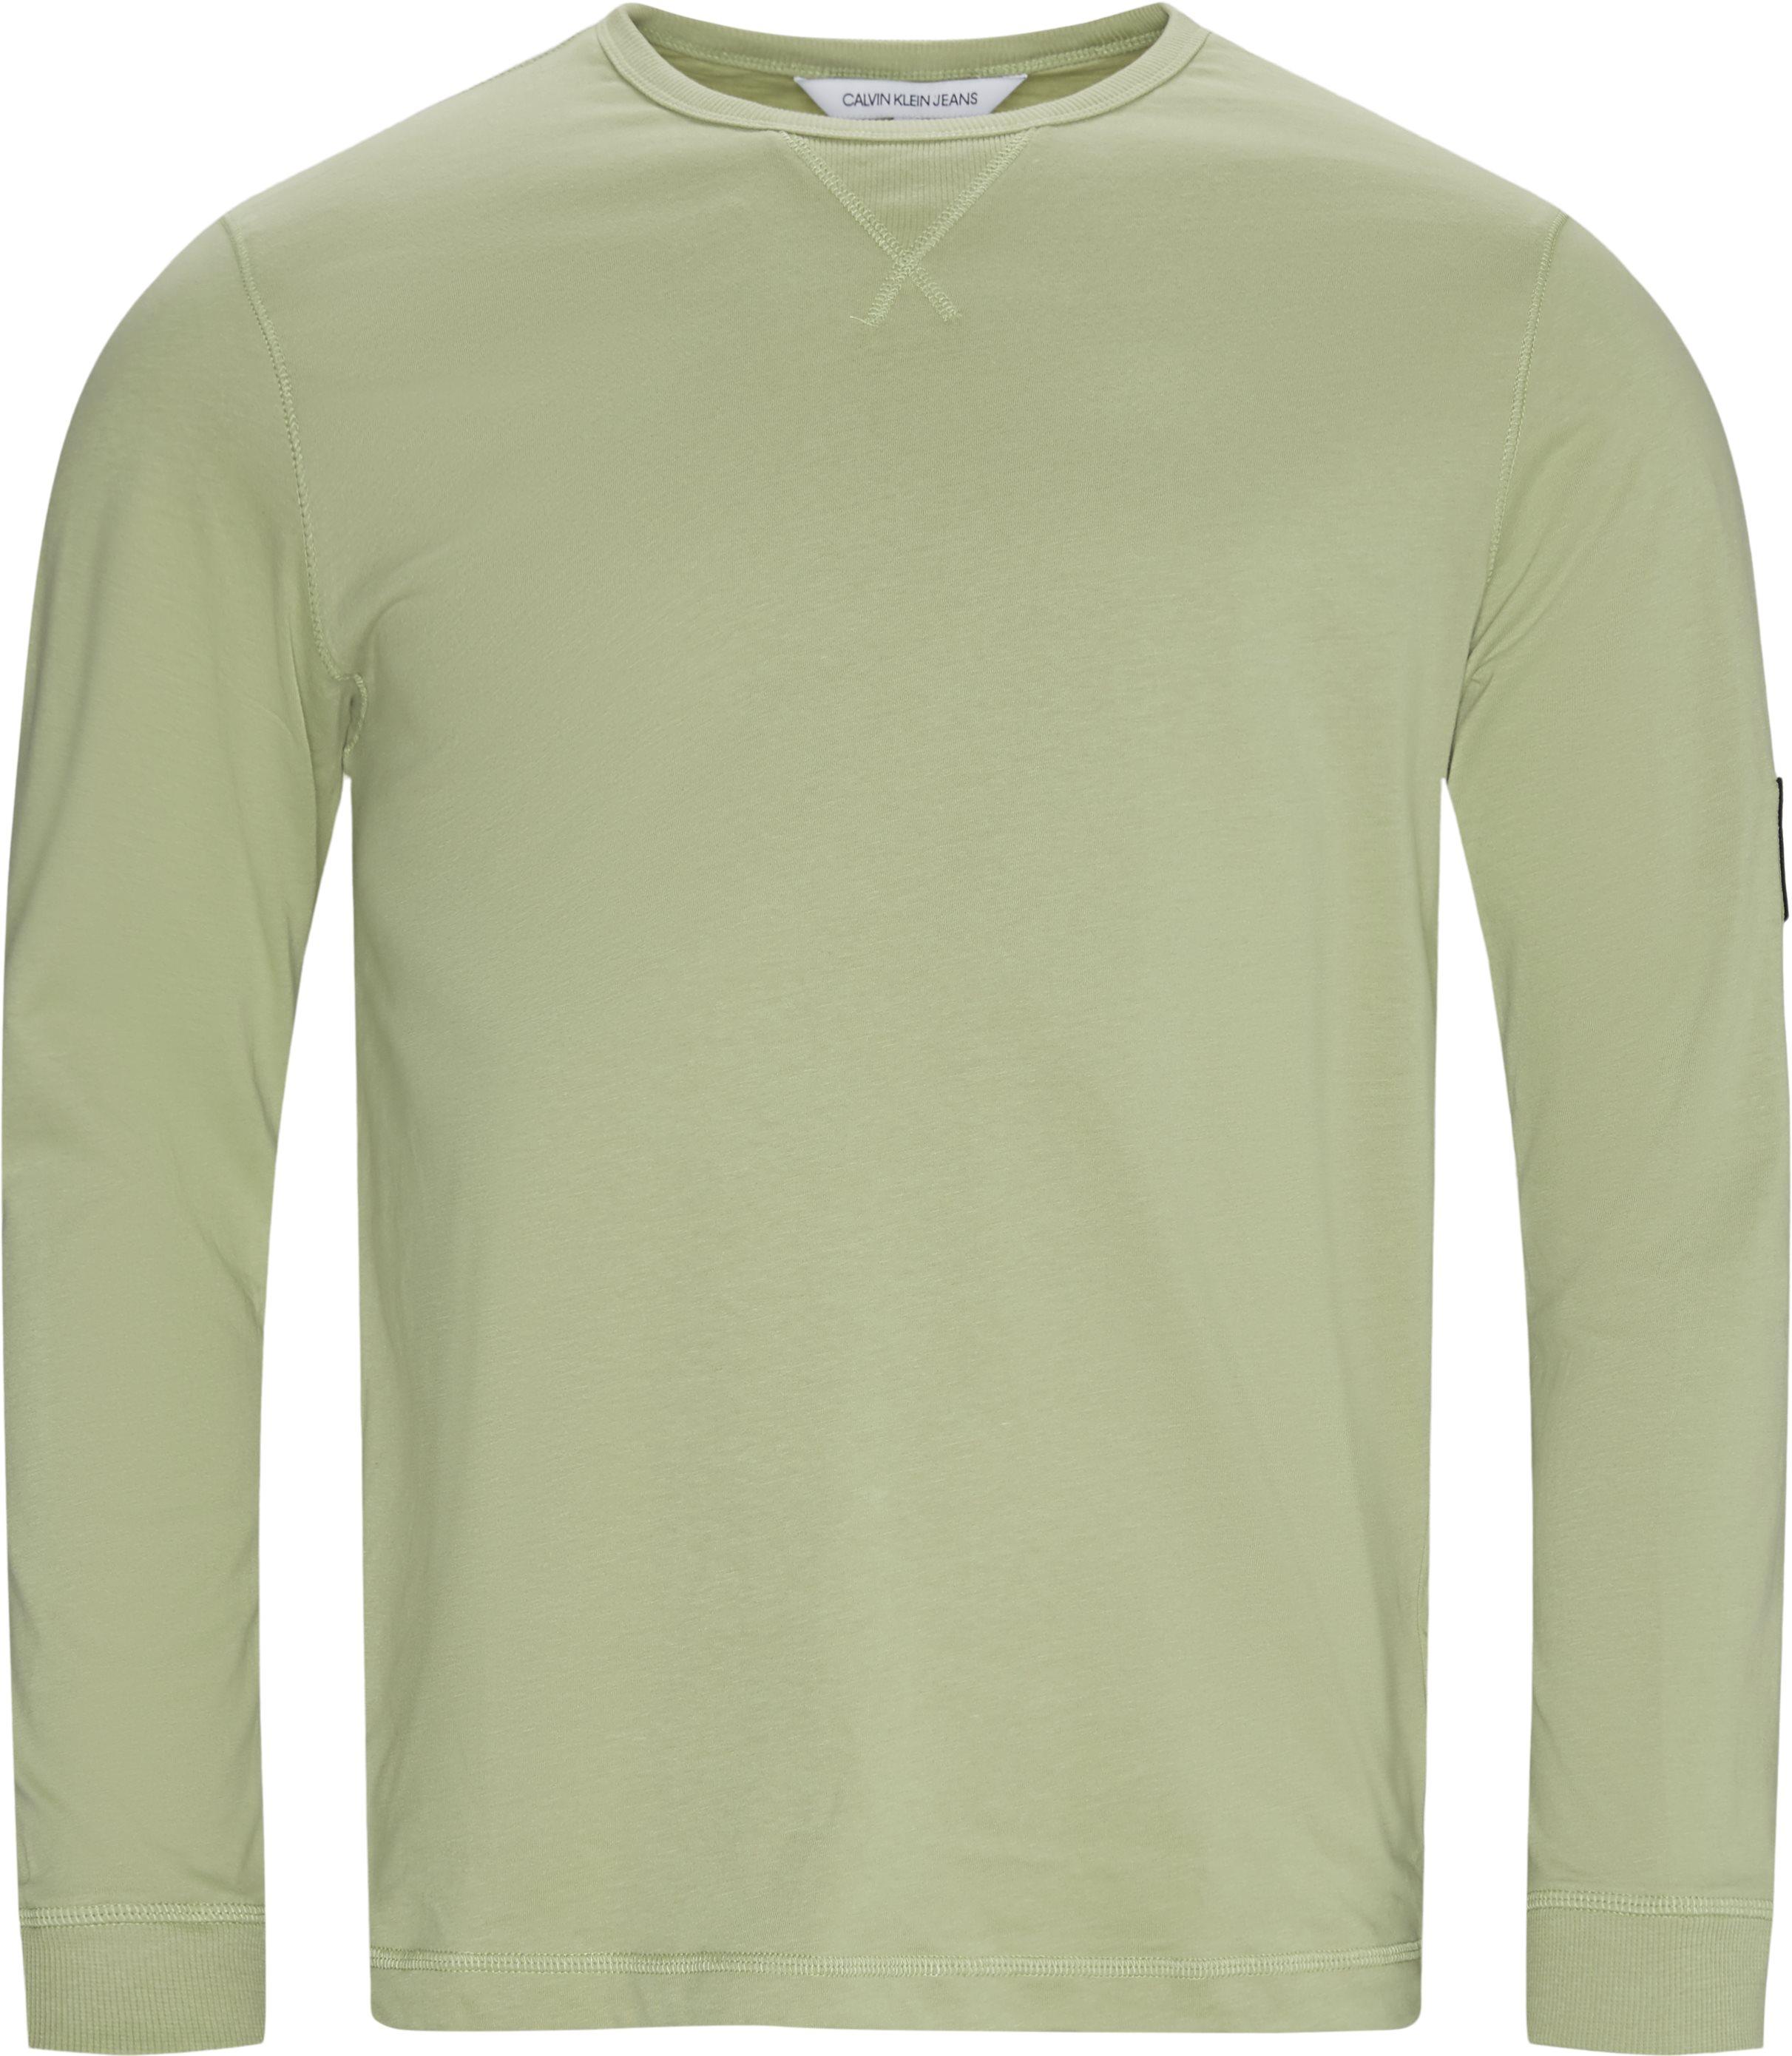 Bae LS Tee - T-shirts - Regular - Grøn